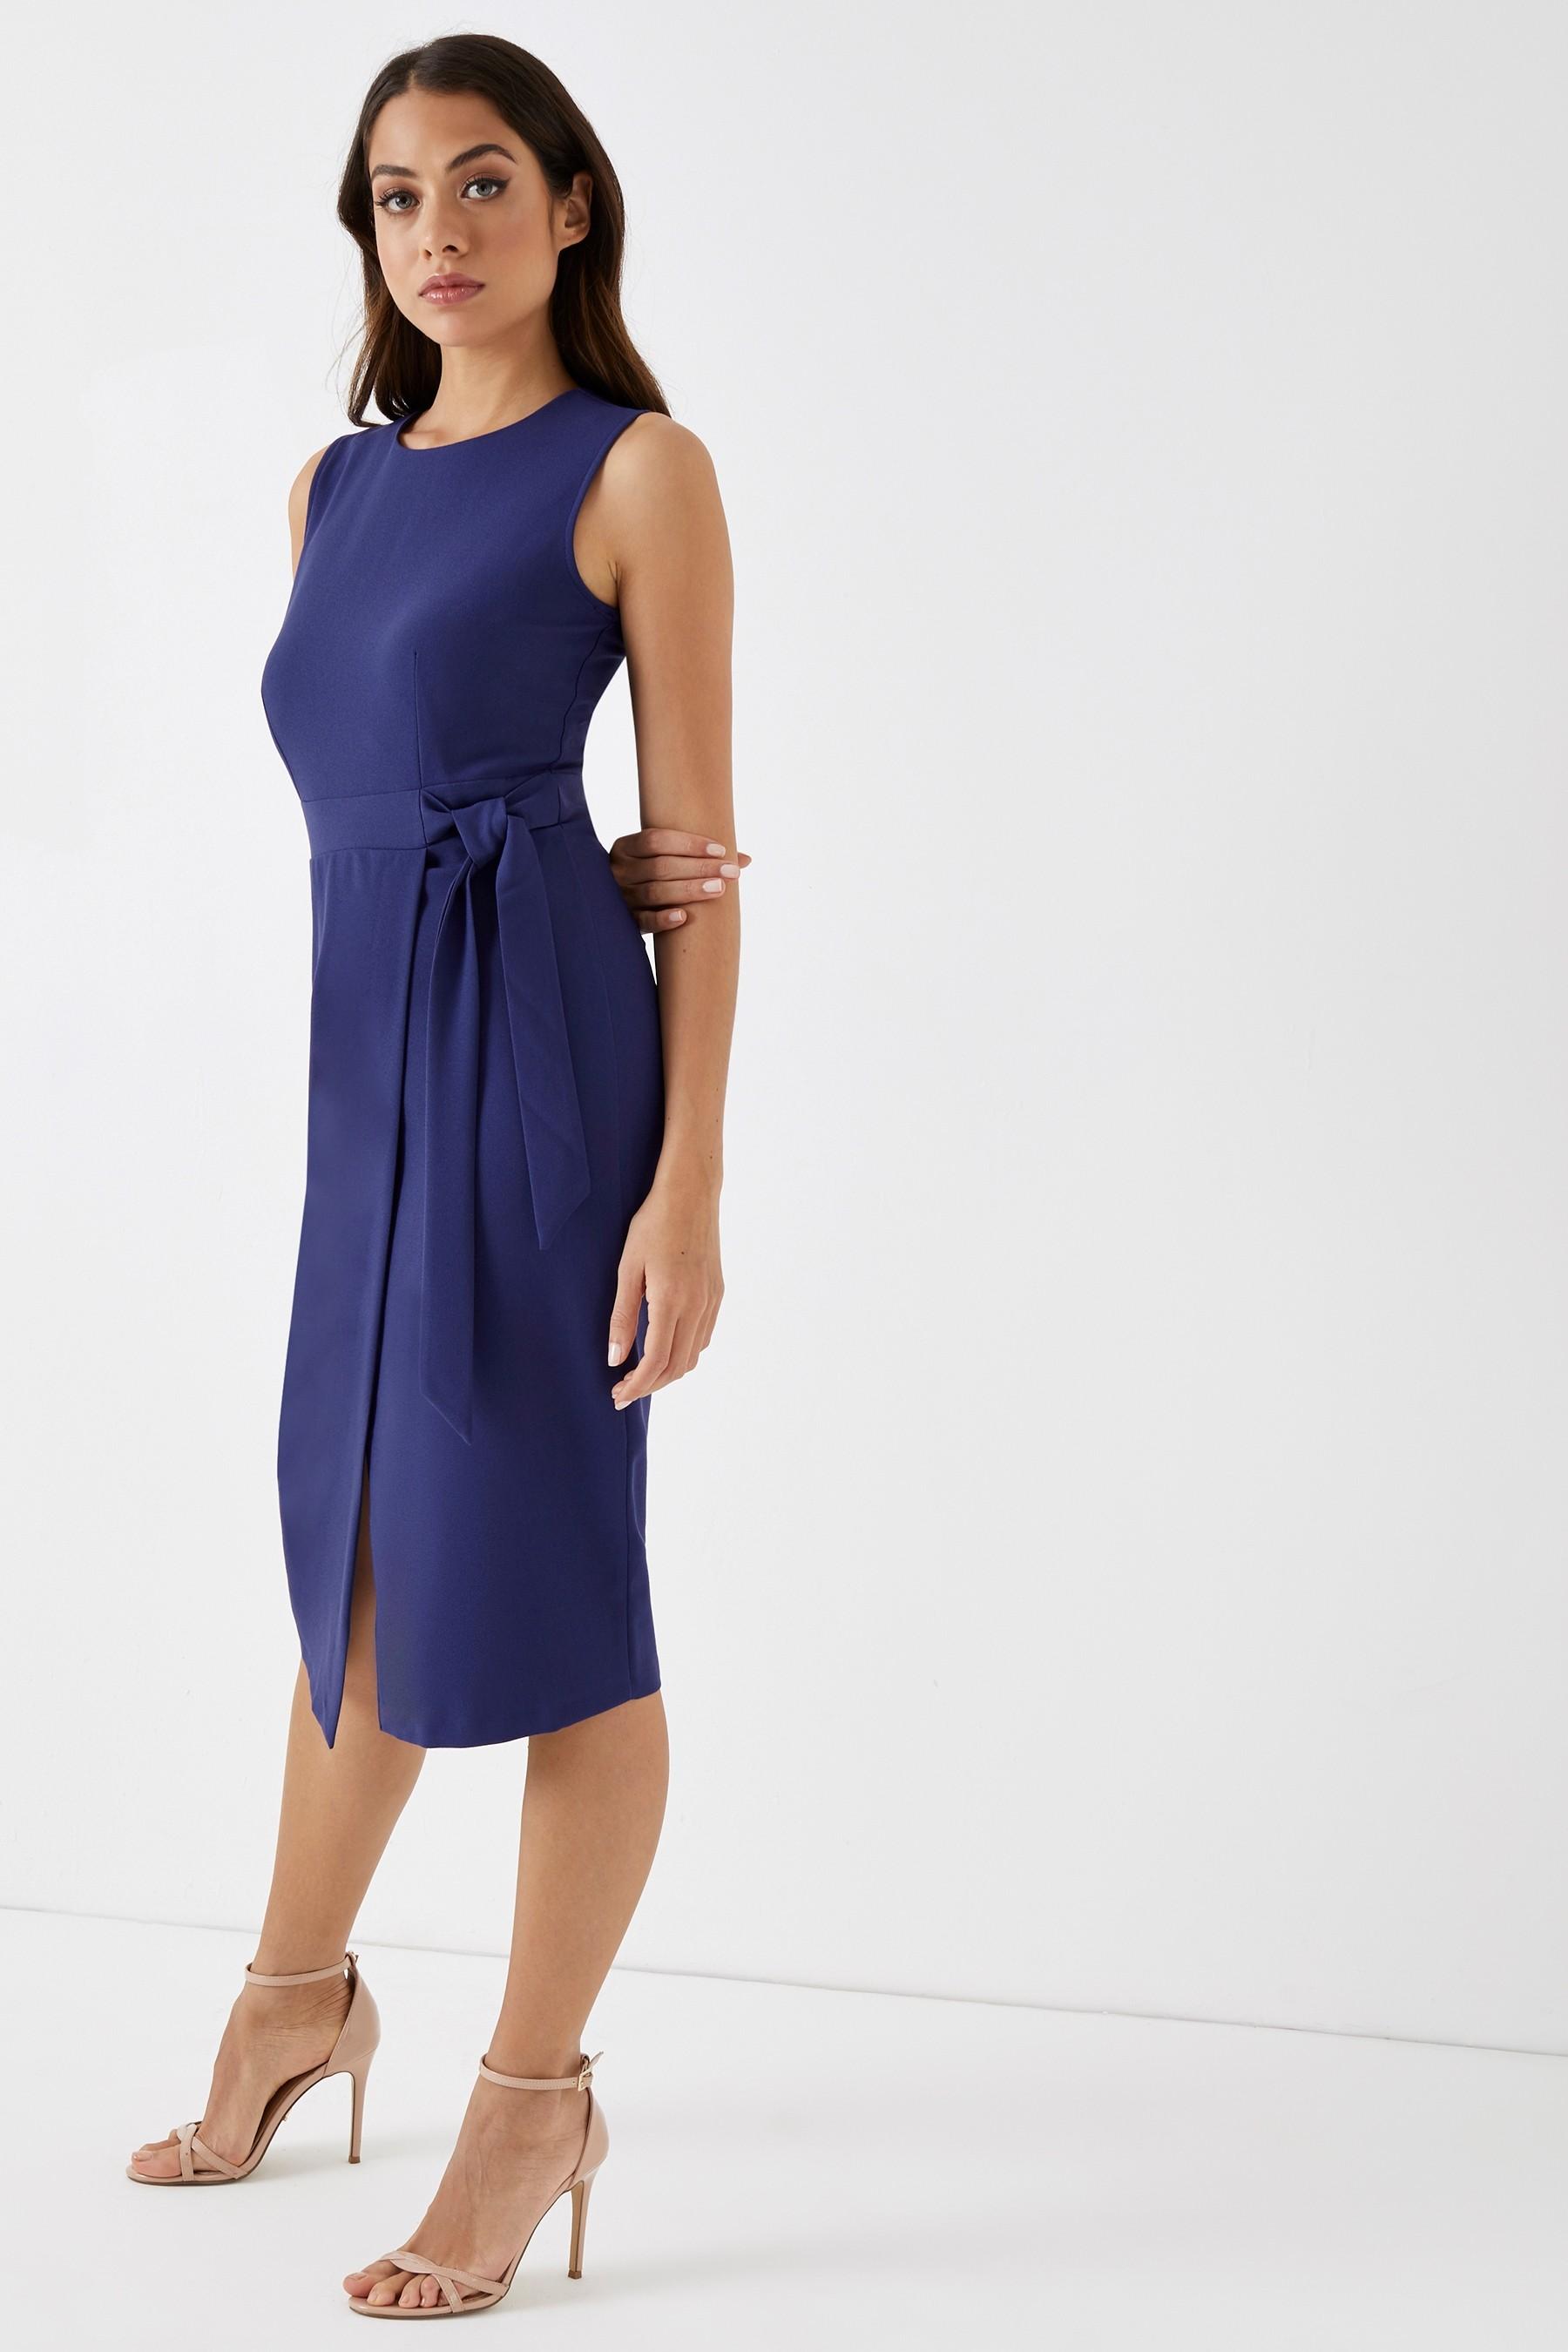 fda4a3b192 Womens Closet Tie V Back Pencil Dress - Blue in 2019   Products ...